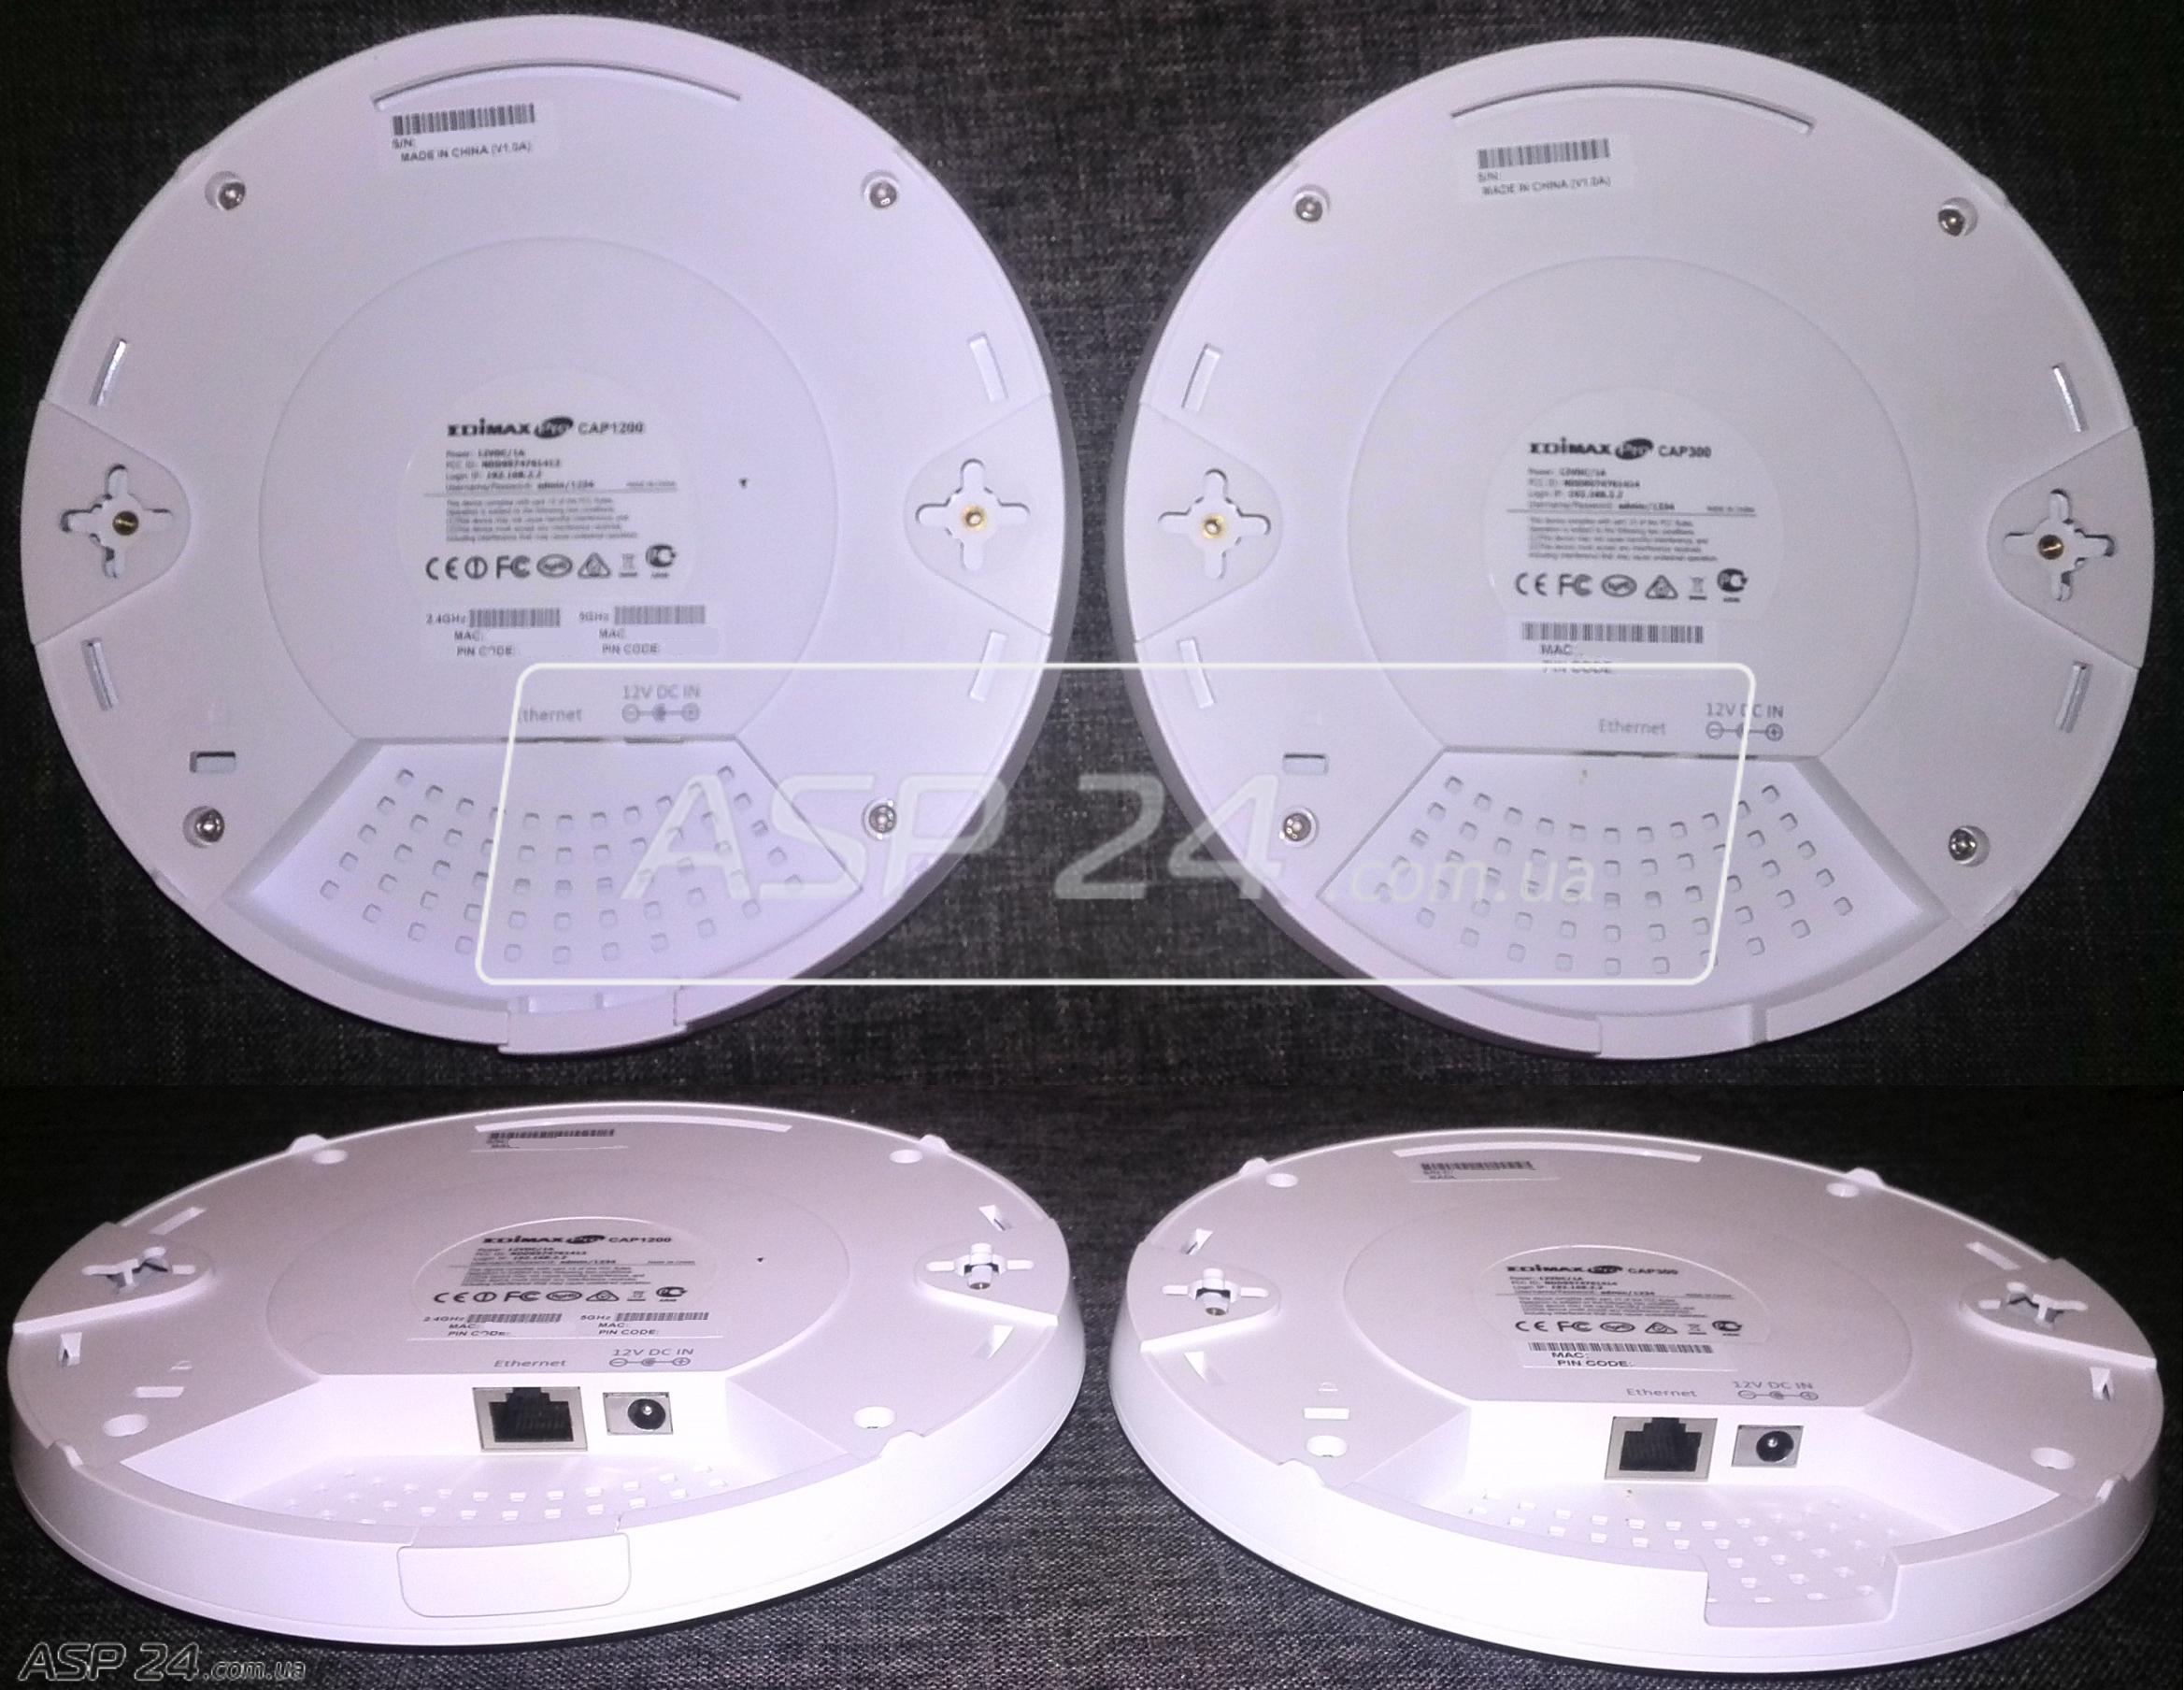 Рис. 6. Edimax Pro CAP1200 и Pro CAP300.